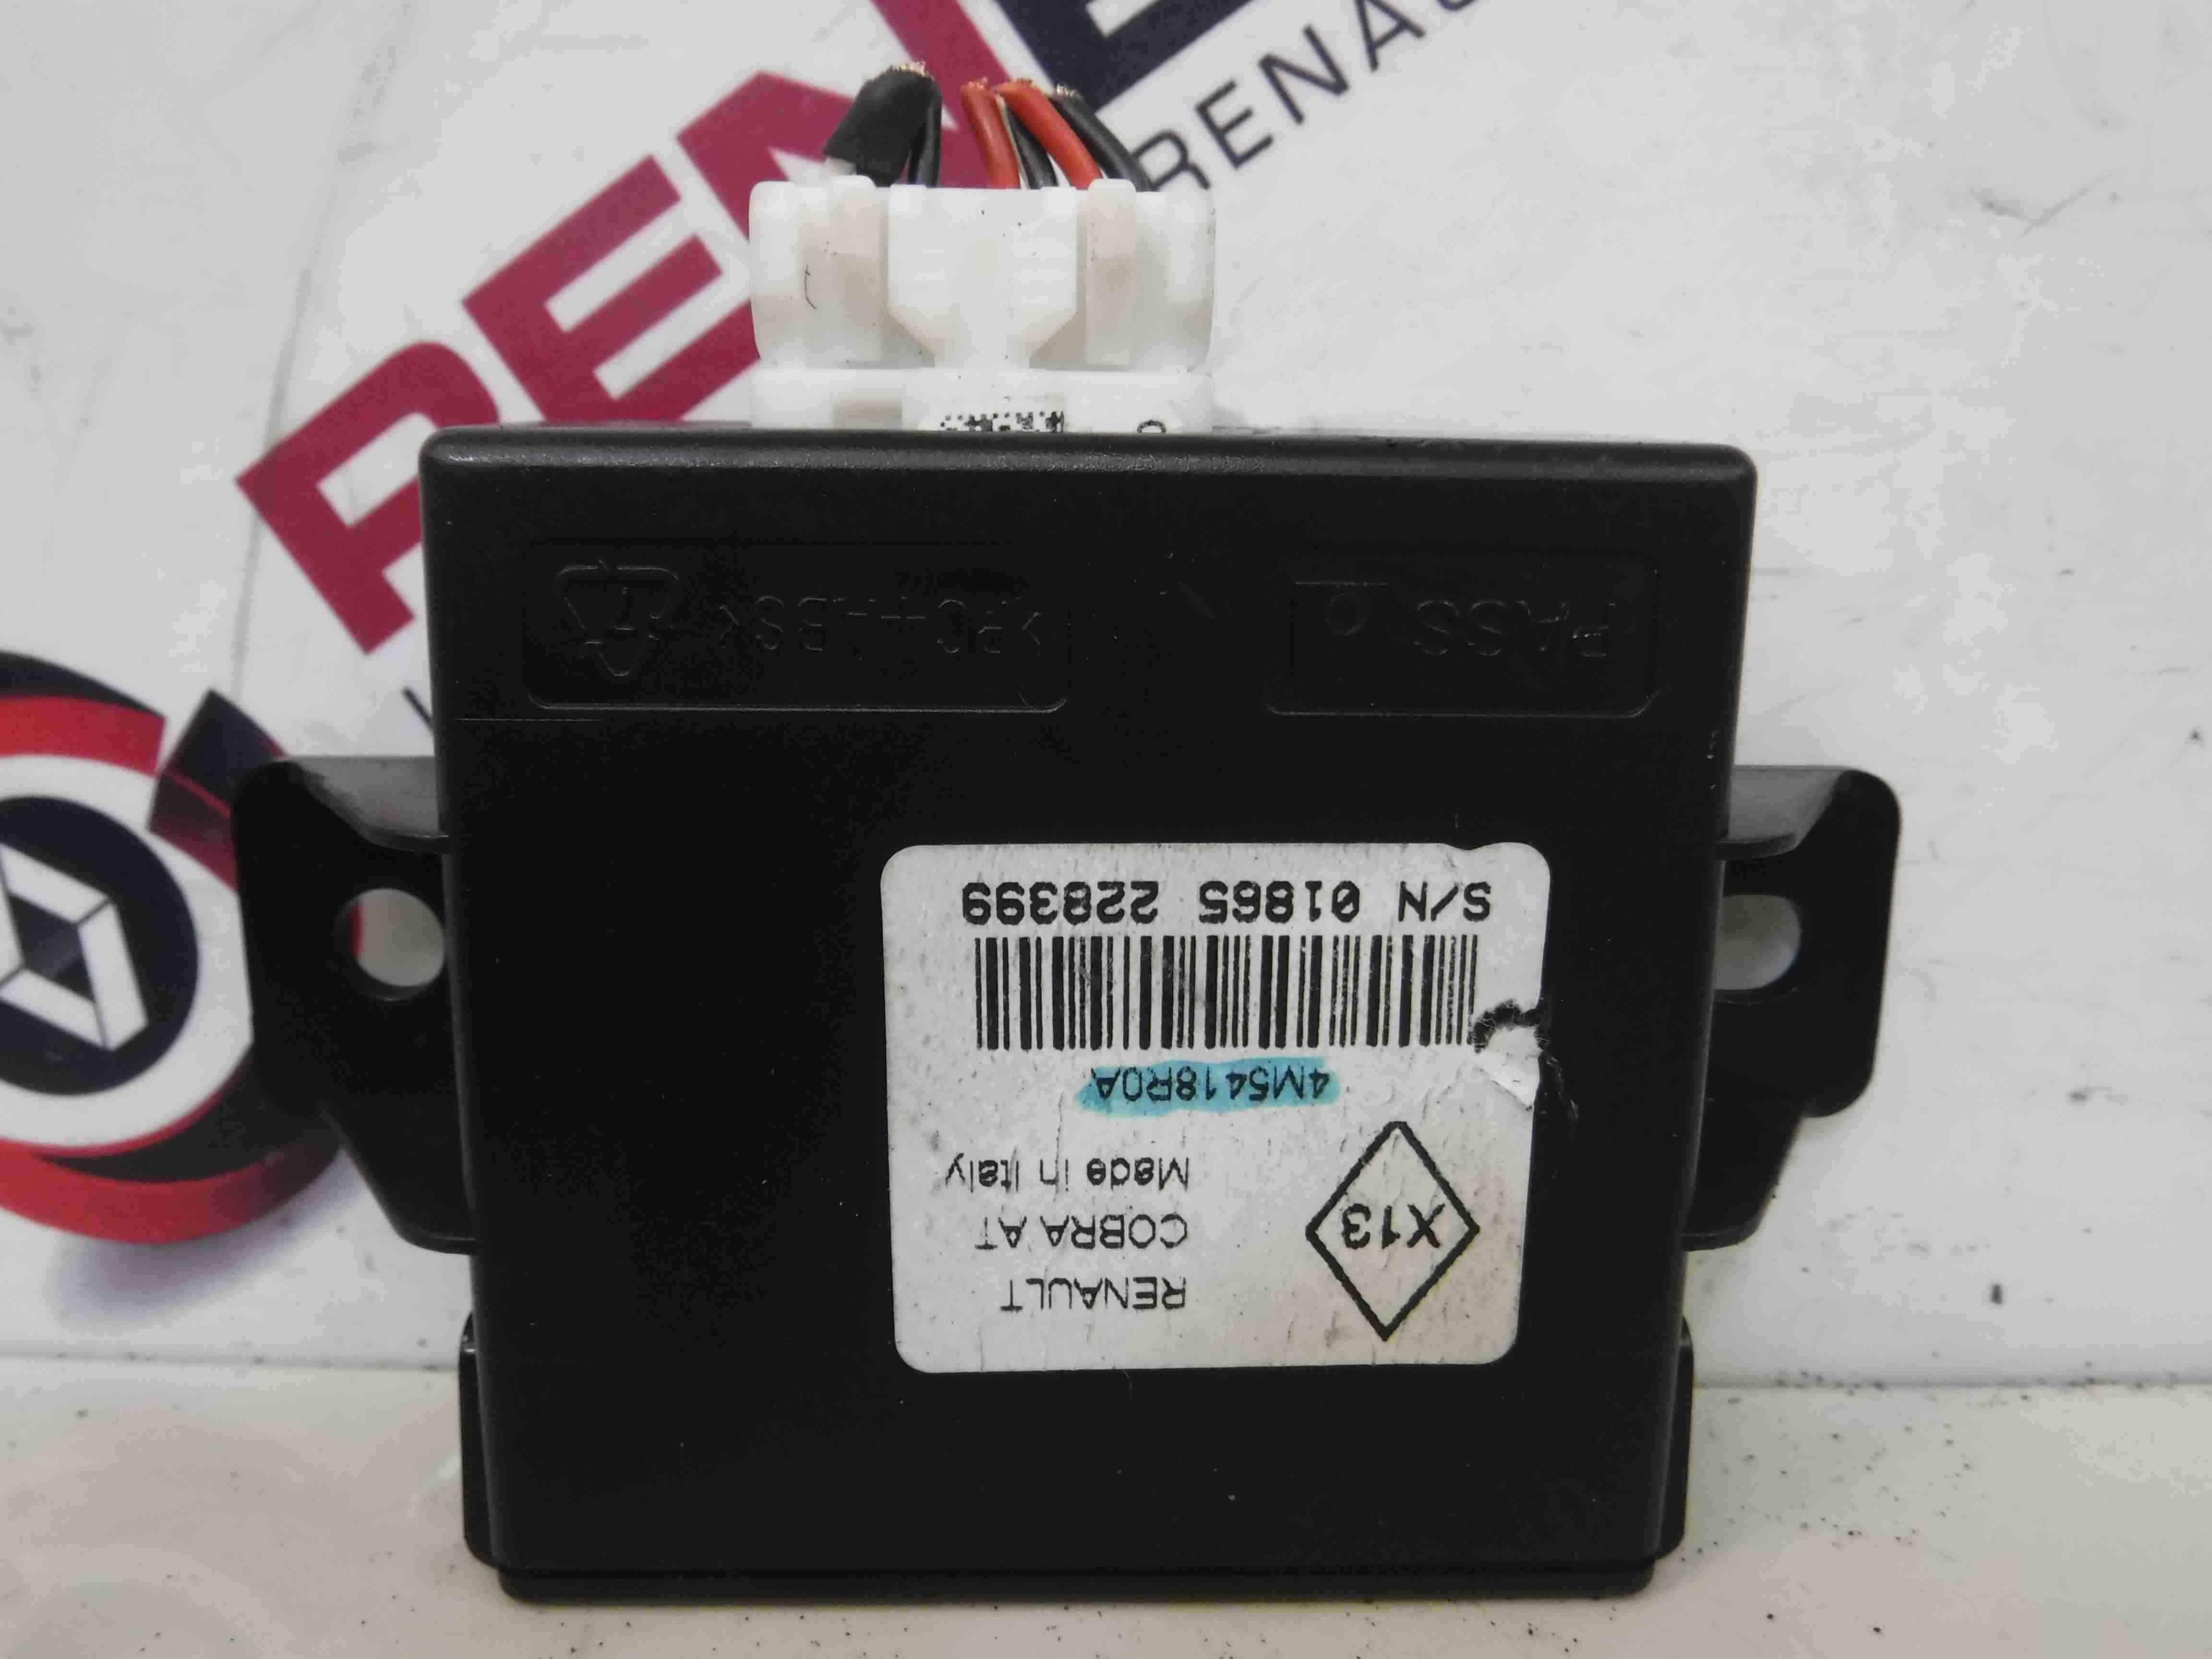 Renault Laguna MK3 2007-2012 Alarm Module ECU Unit Control 4M5418R0A